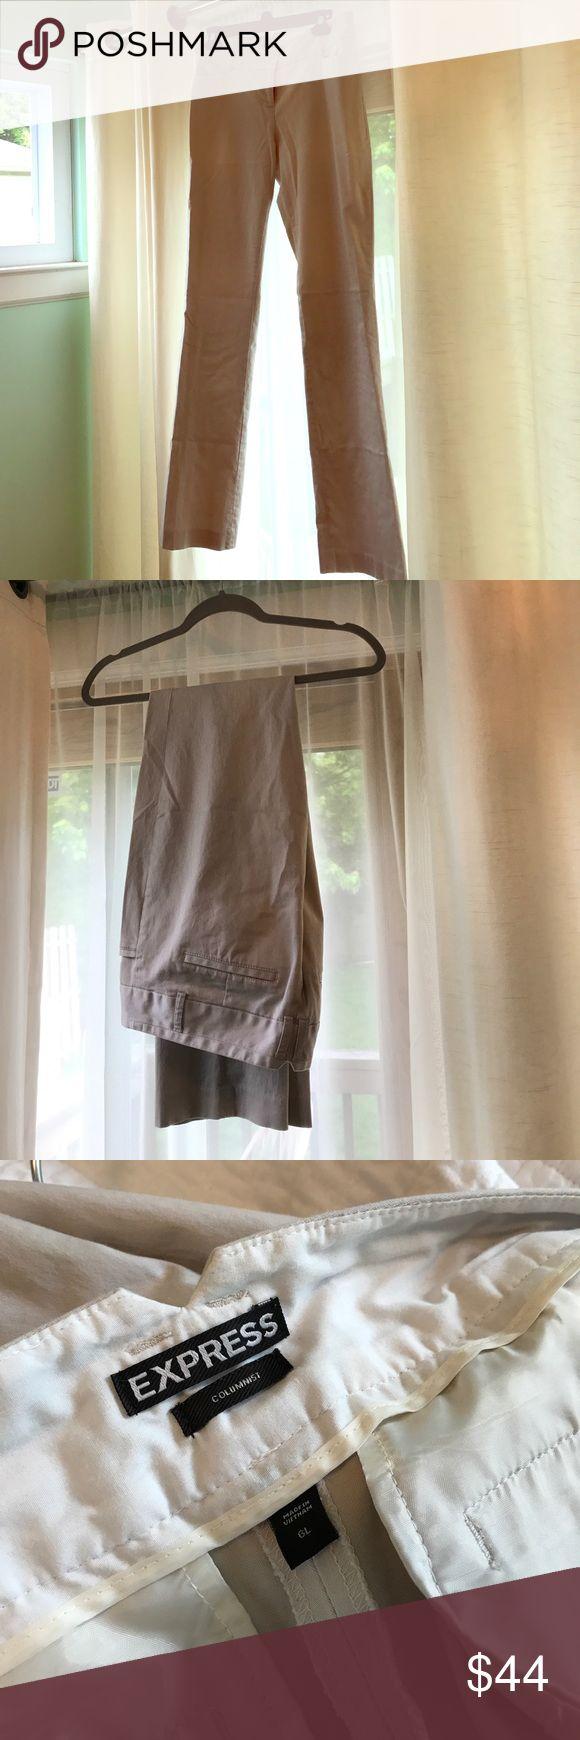 Selling this Express Columnist Dress Pants on Poshmark! My username is: m_lentini. #shopmycloset #poshmark #fashion #shopping #style #forsale #Express #Pants